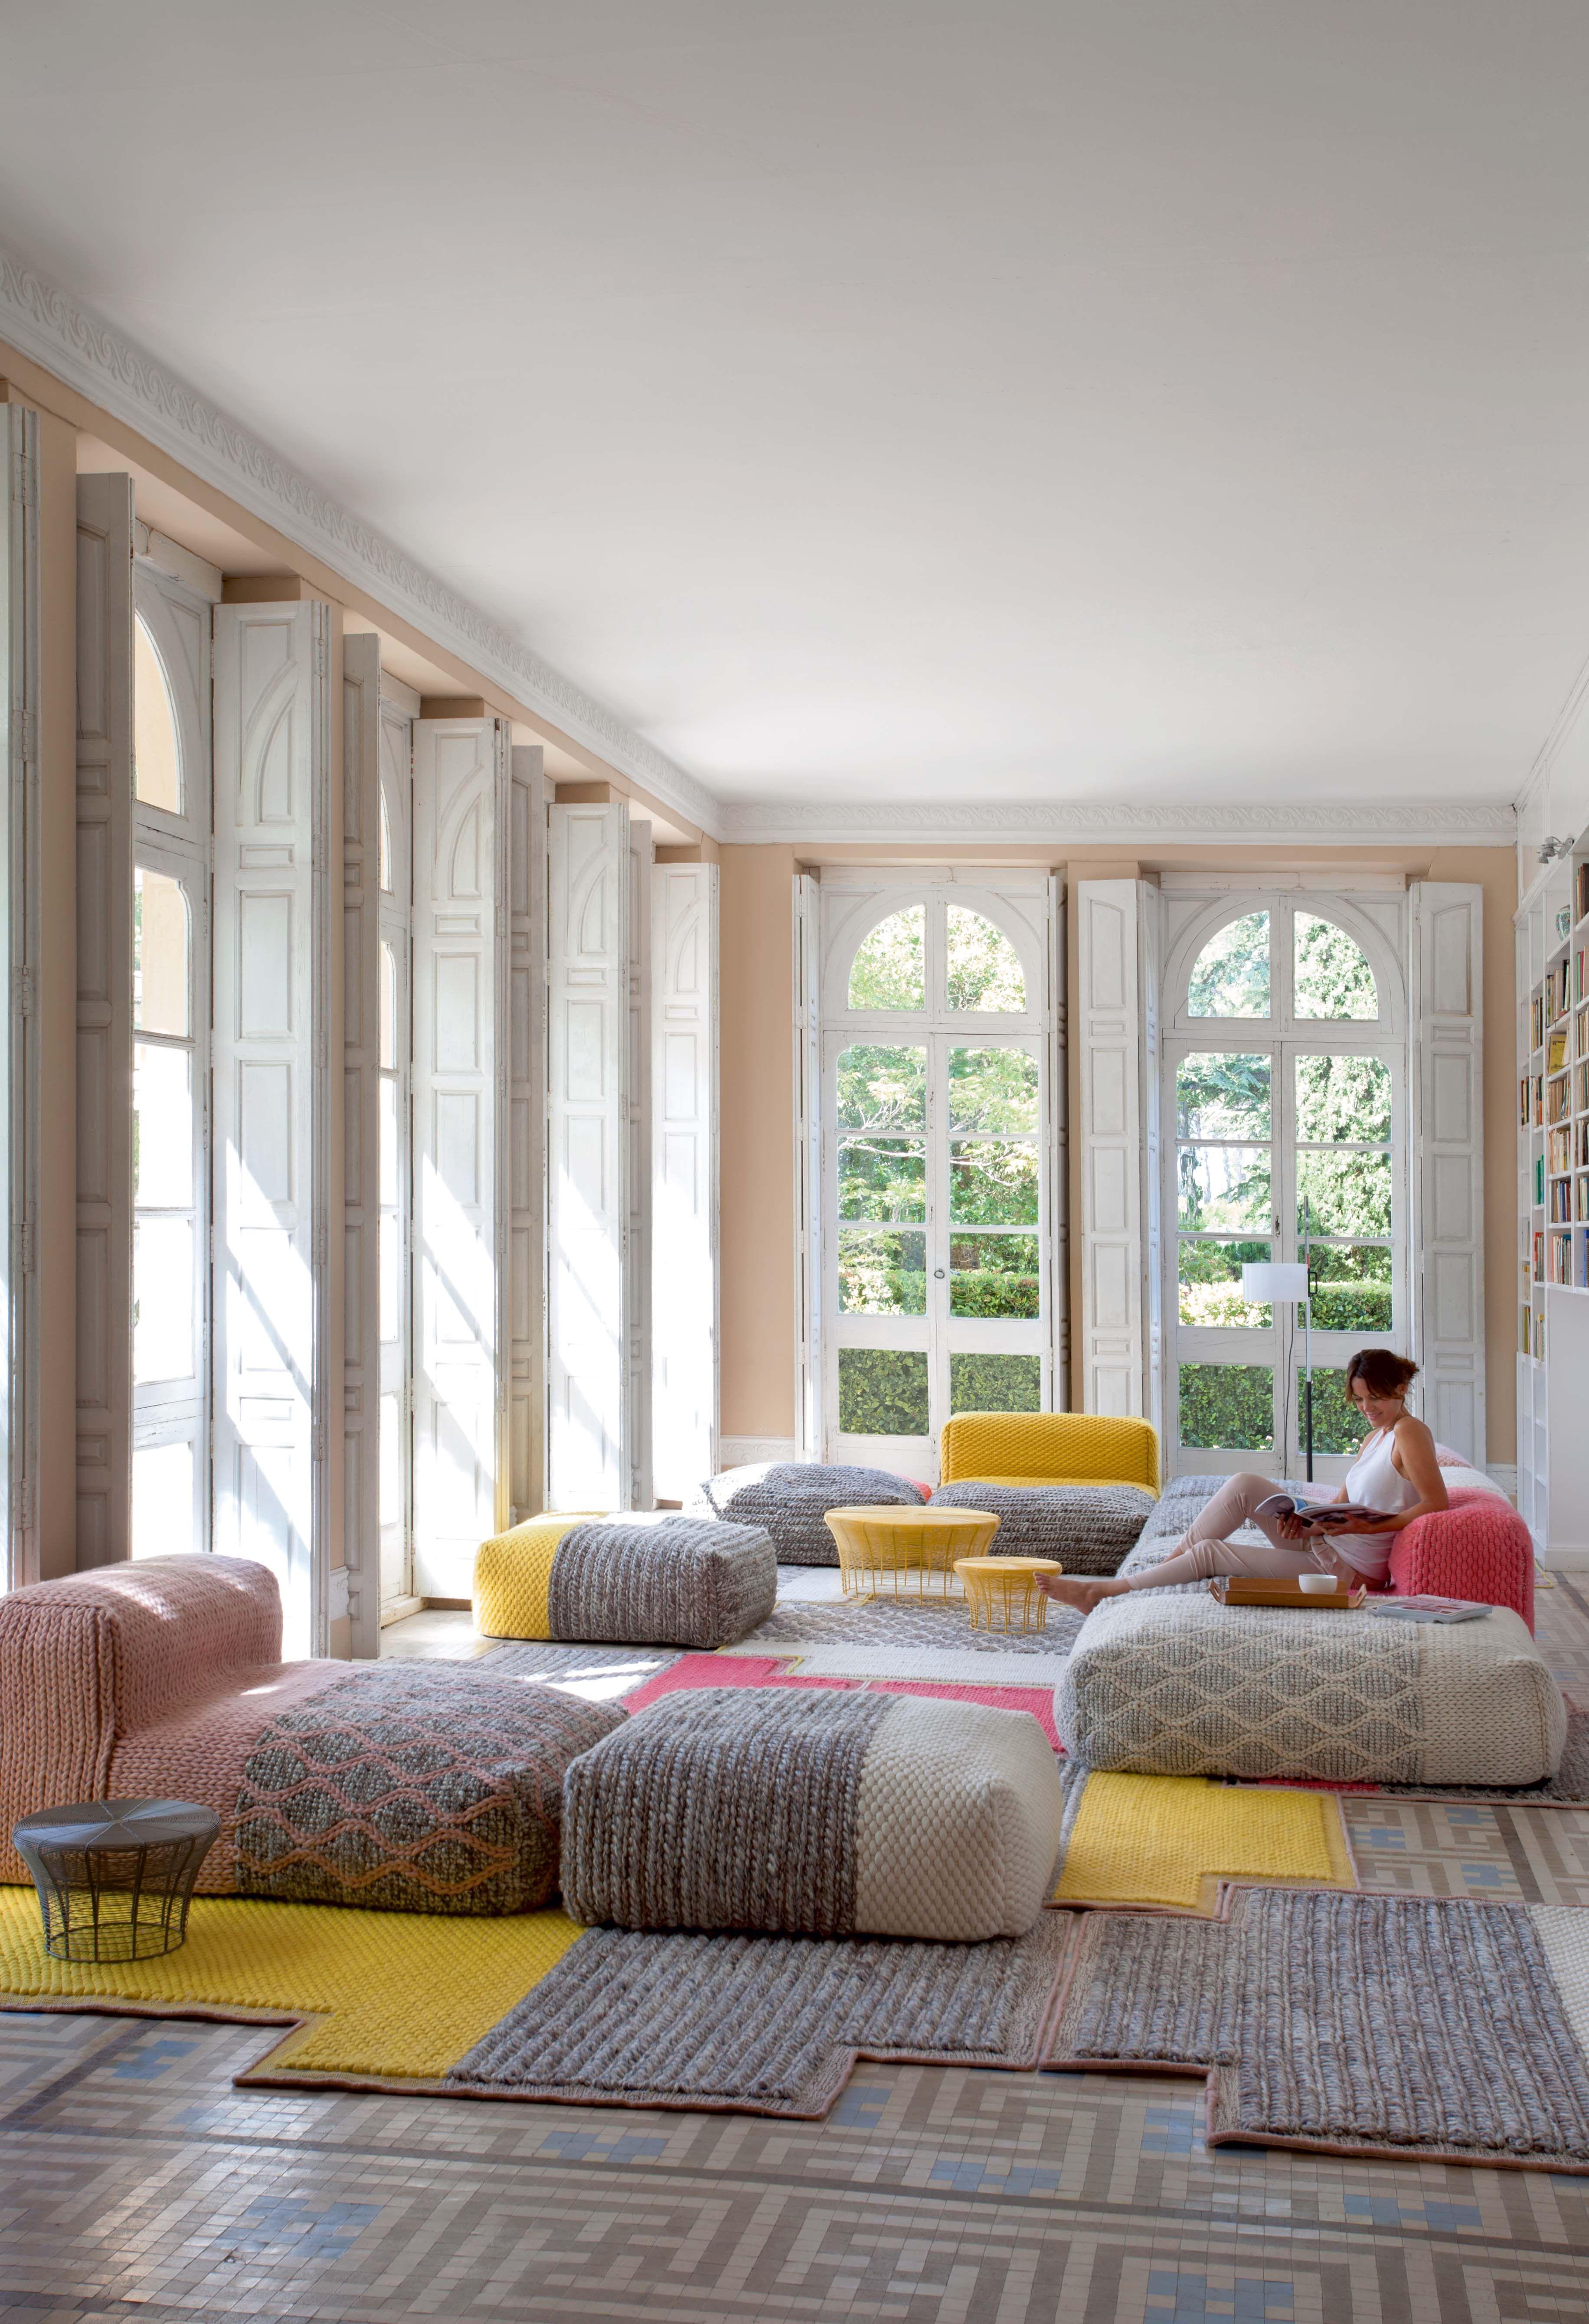 Mangas Space design Patricia Urquiola for GAN, the textile brand of ...